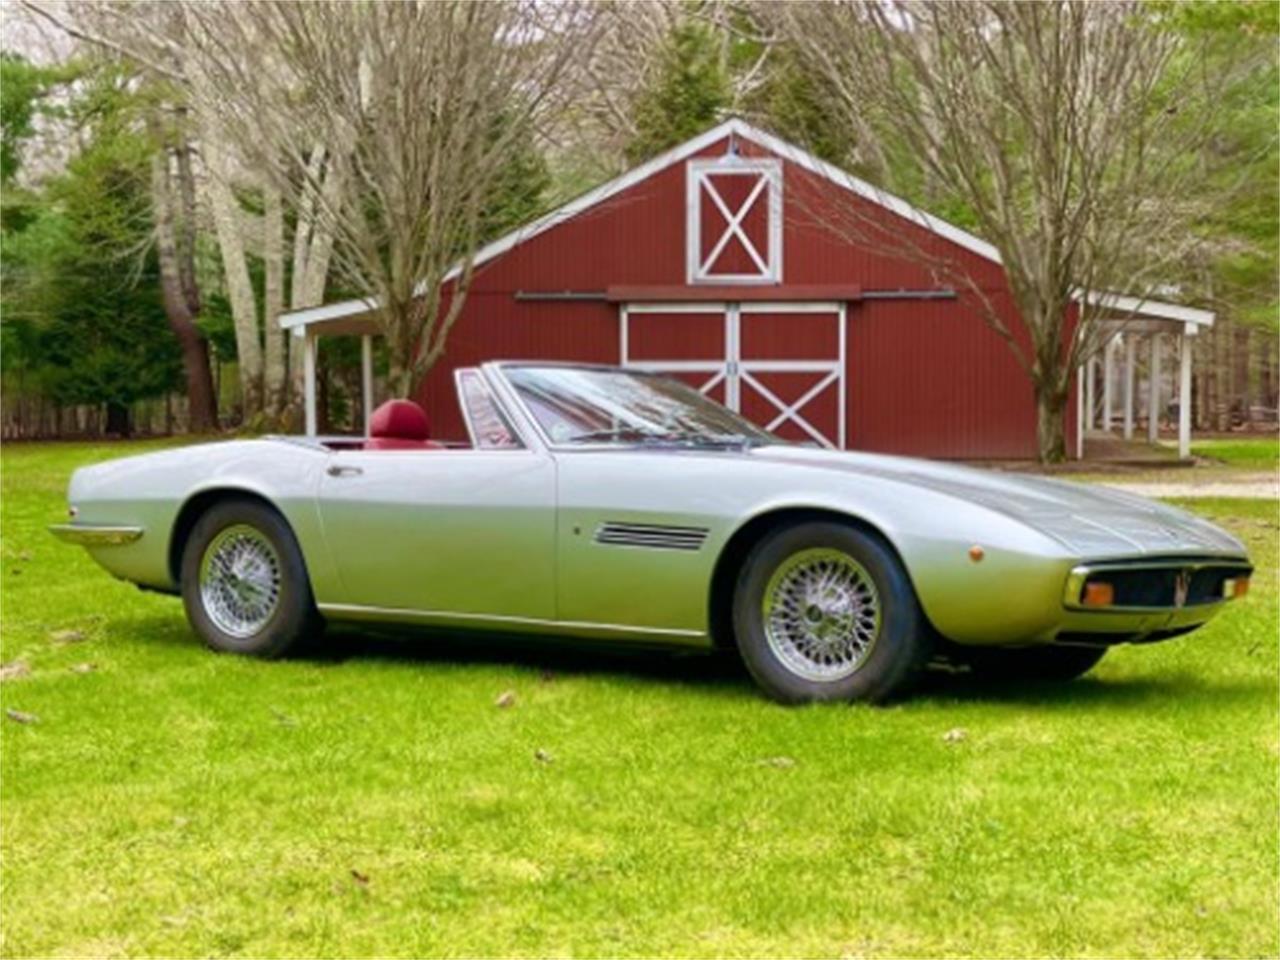 1970 Maserati Ghibli for Sale | ClassicCars.com | CC-1435558